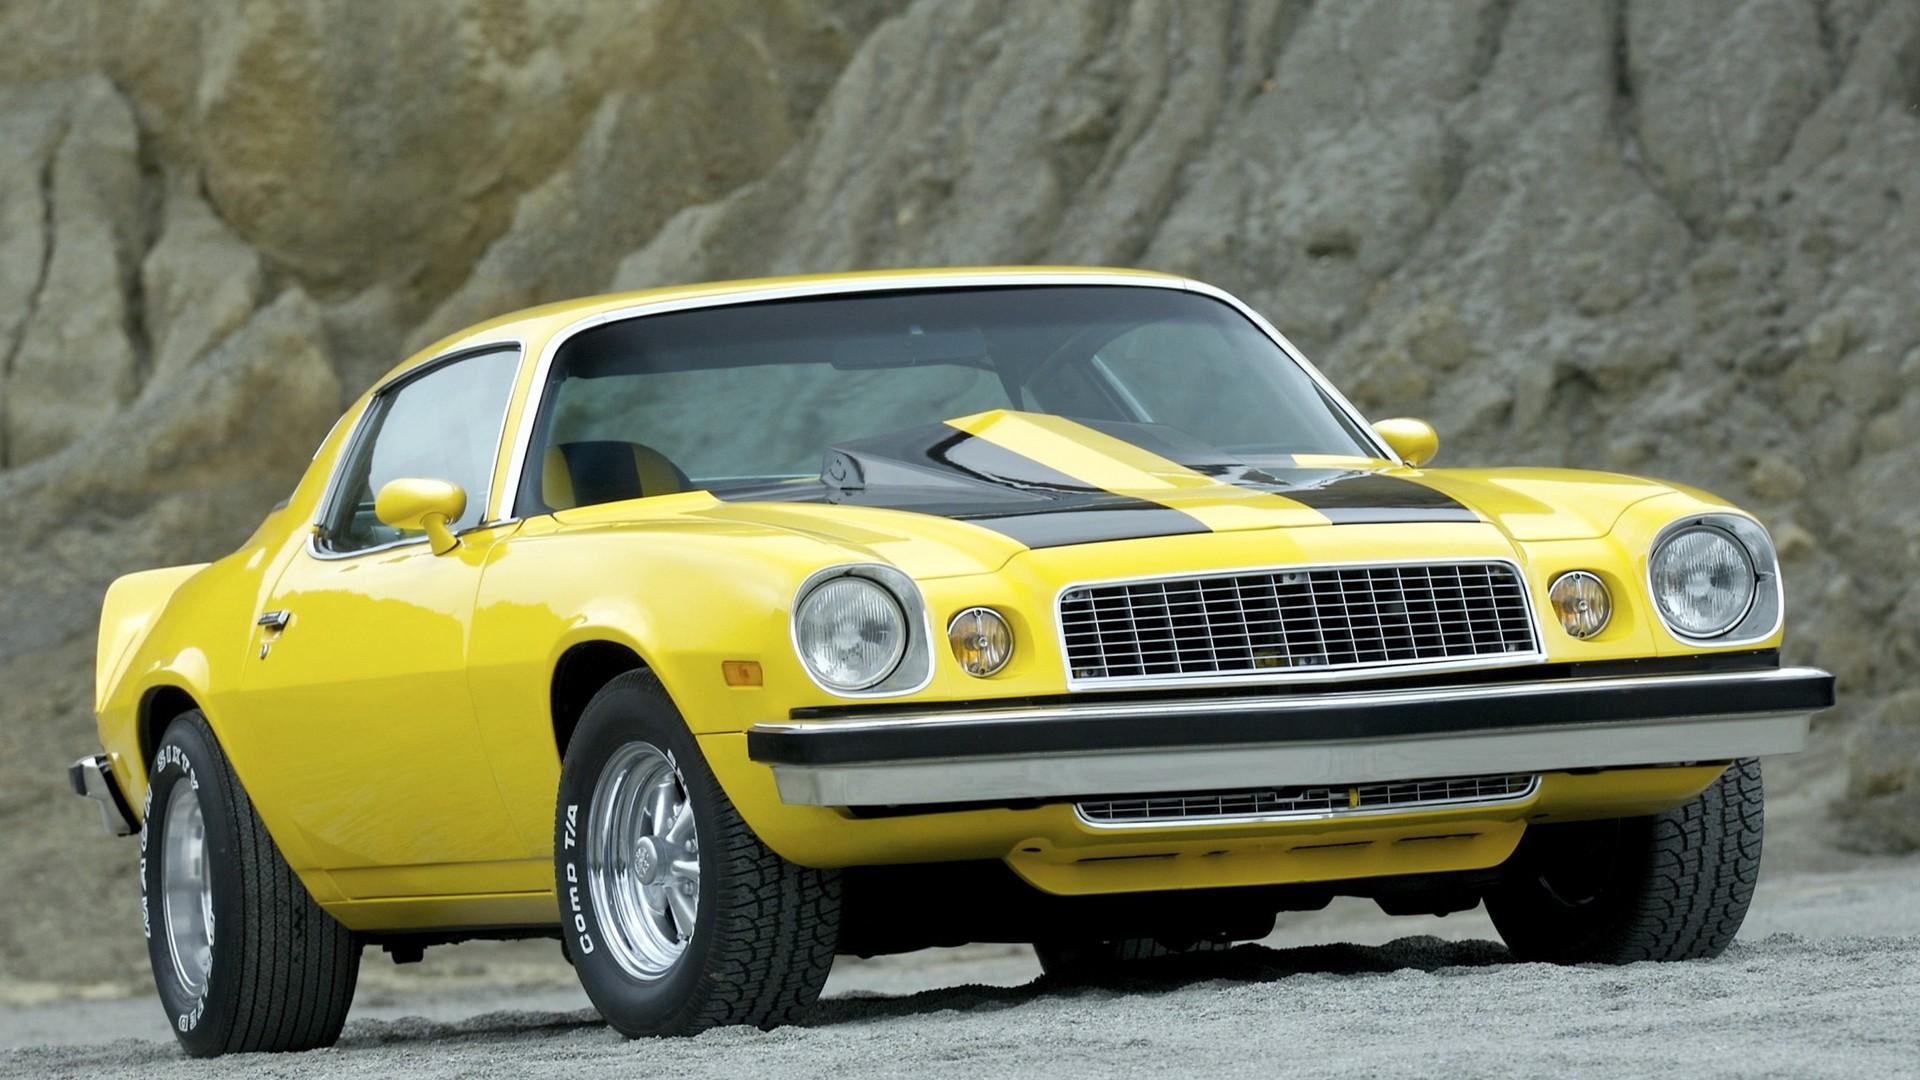 Chevrolet Camaro SS Convertible Wallpapers